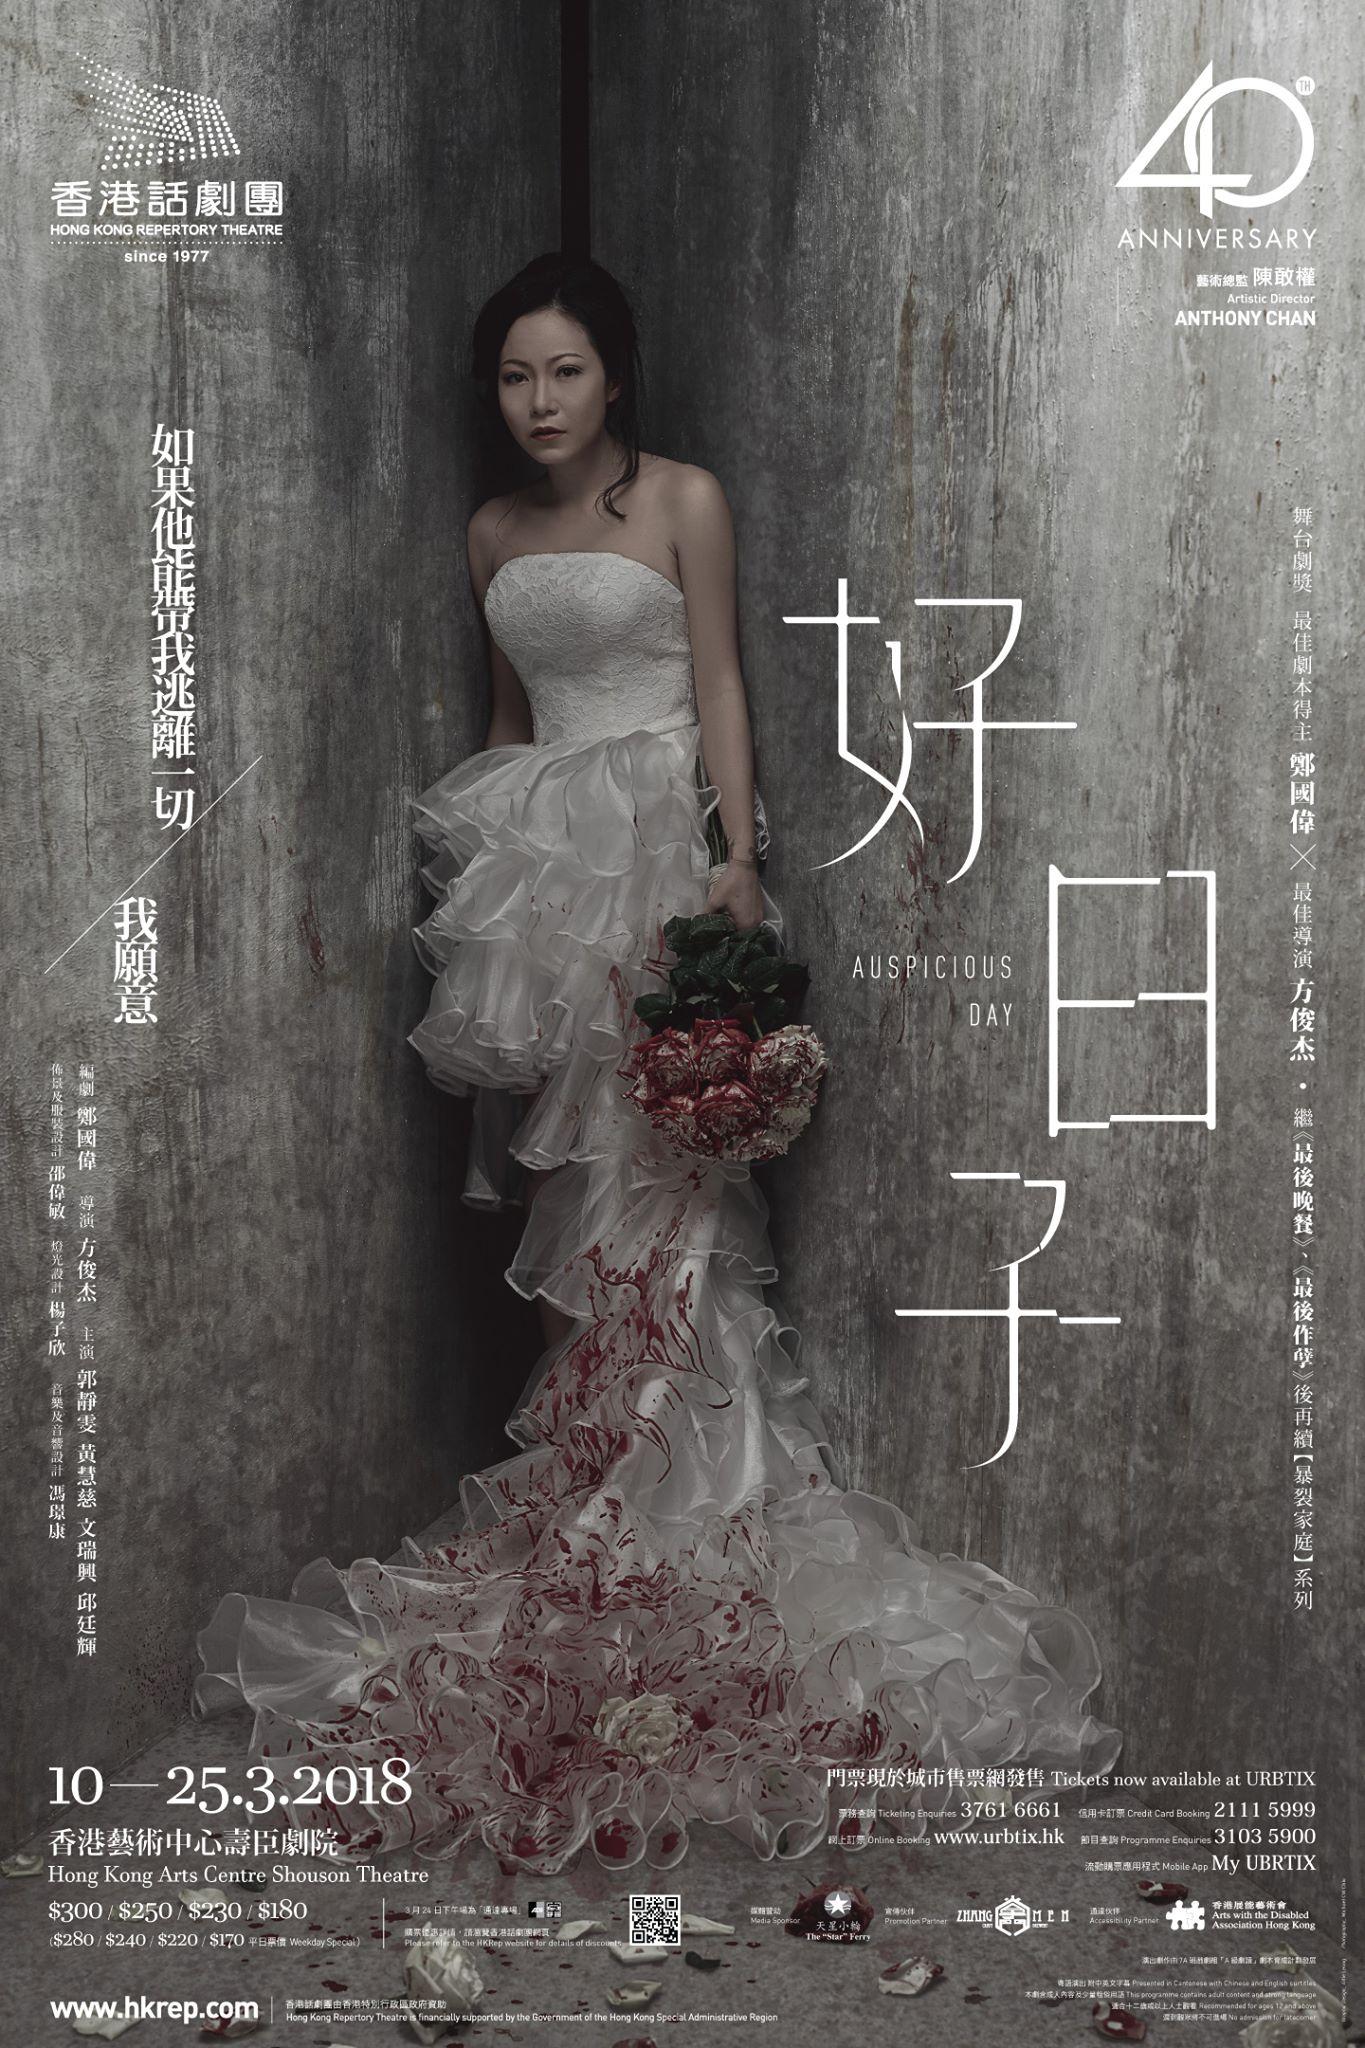 HKREP 好日子 (Auspicious Day) Poster. Hong Kong. 2018